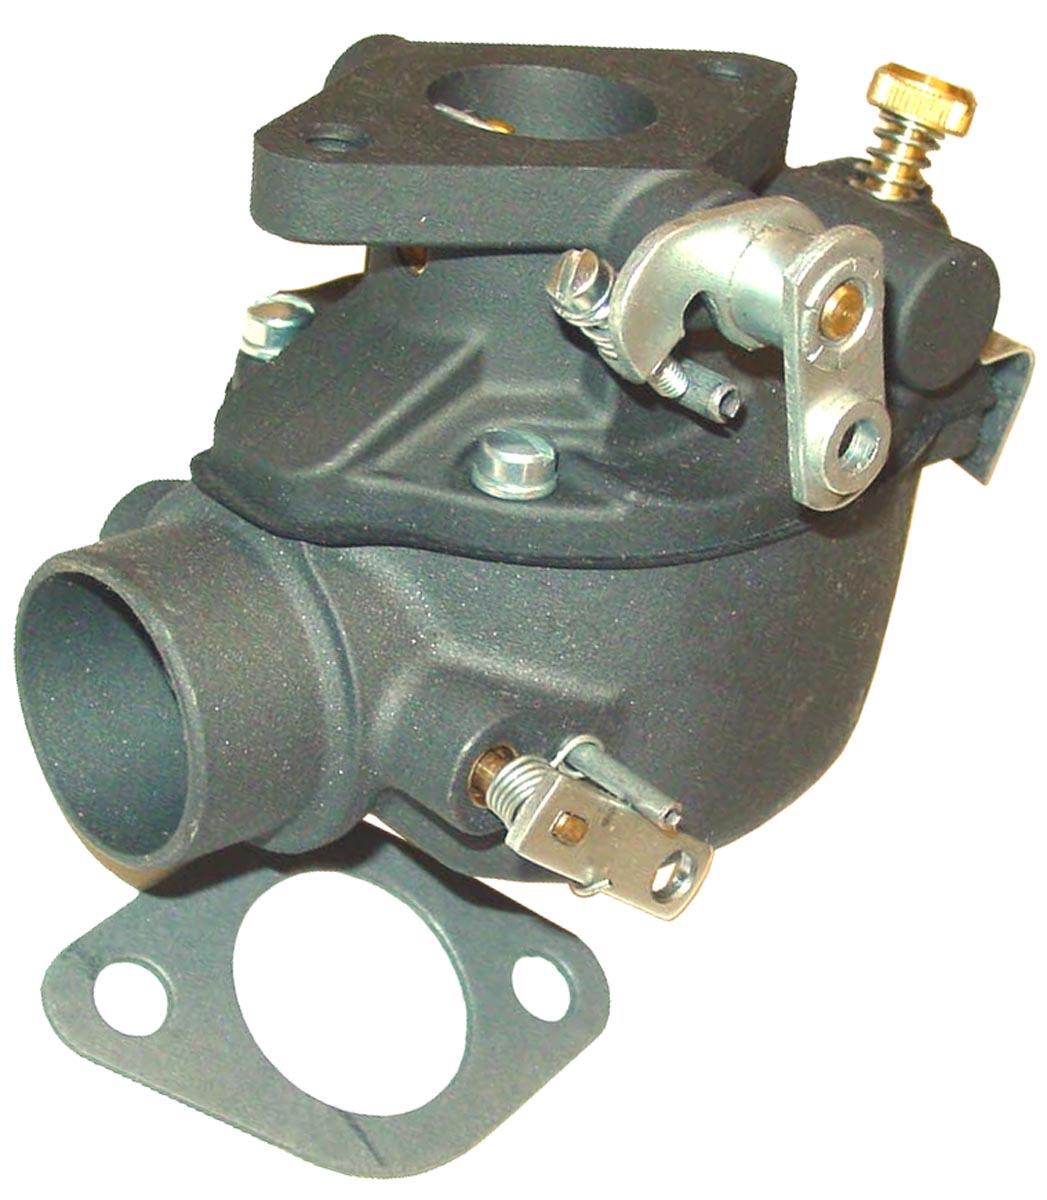 Marvel Schebler Carburetor